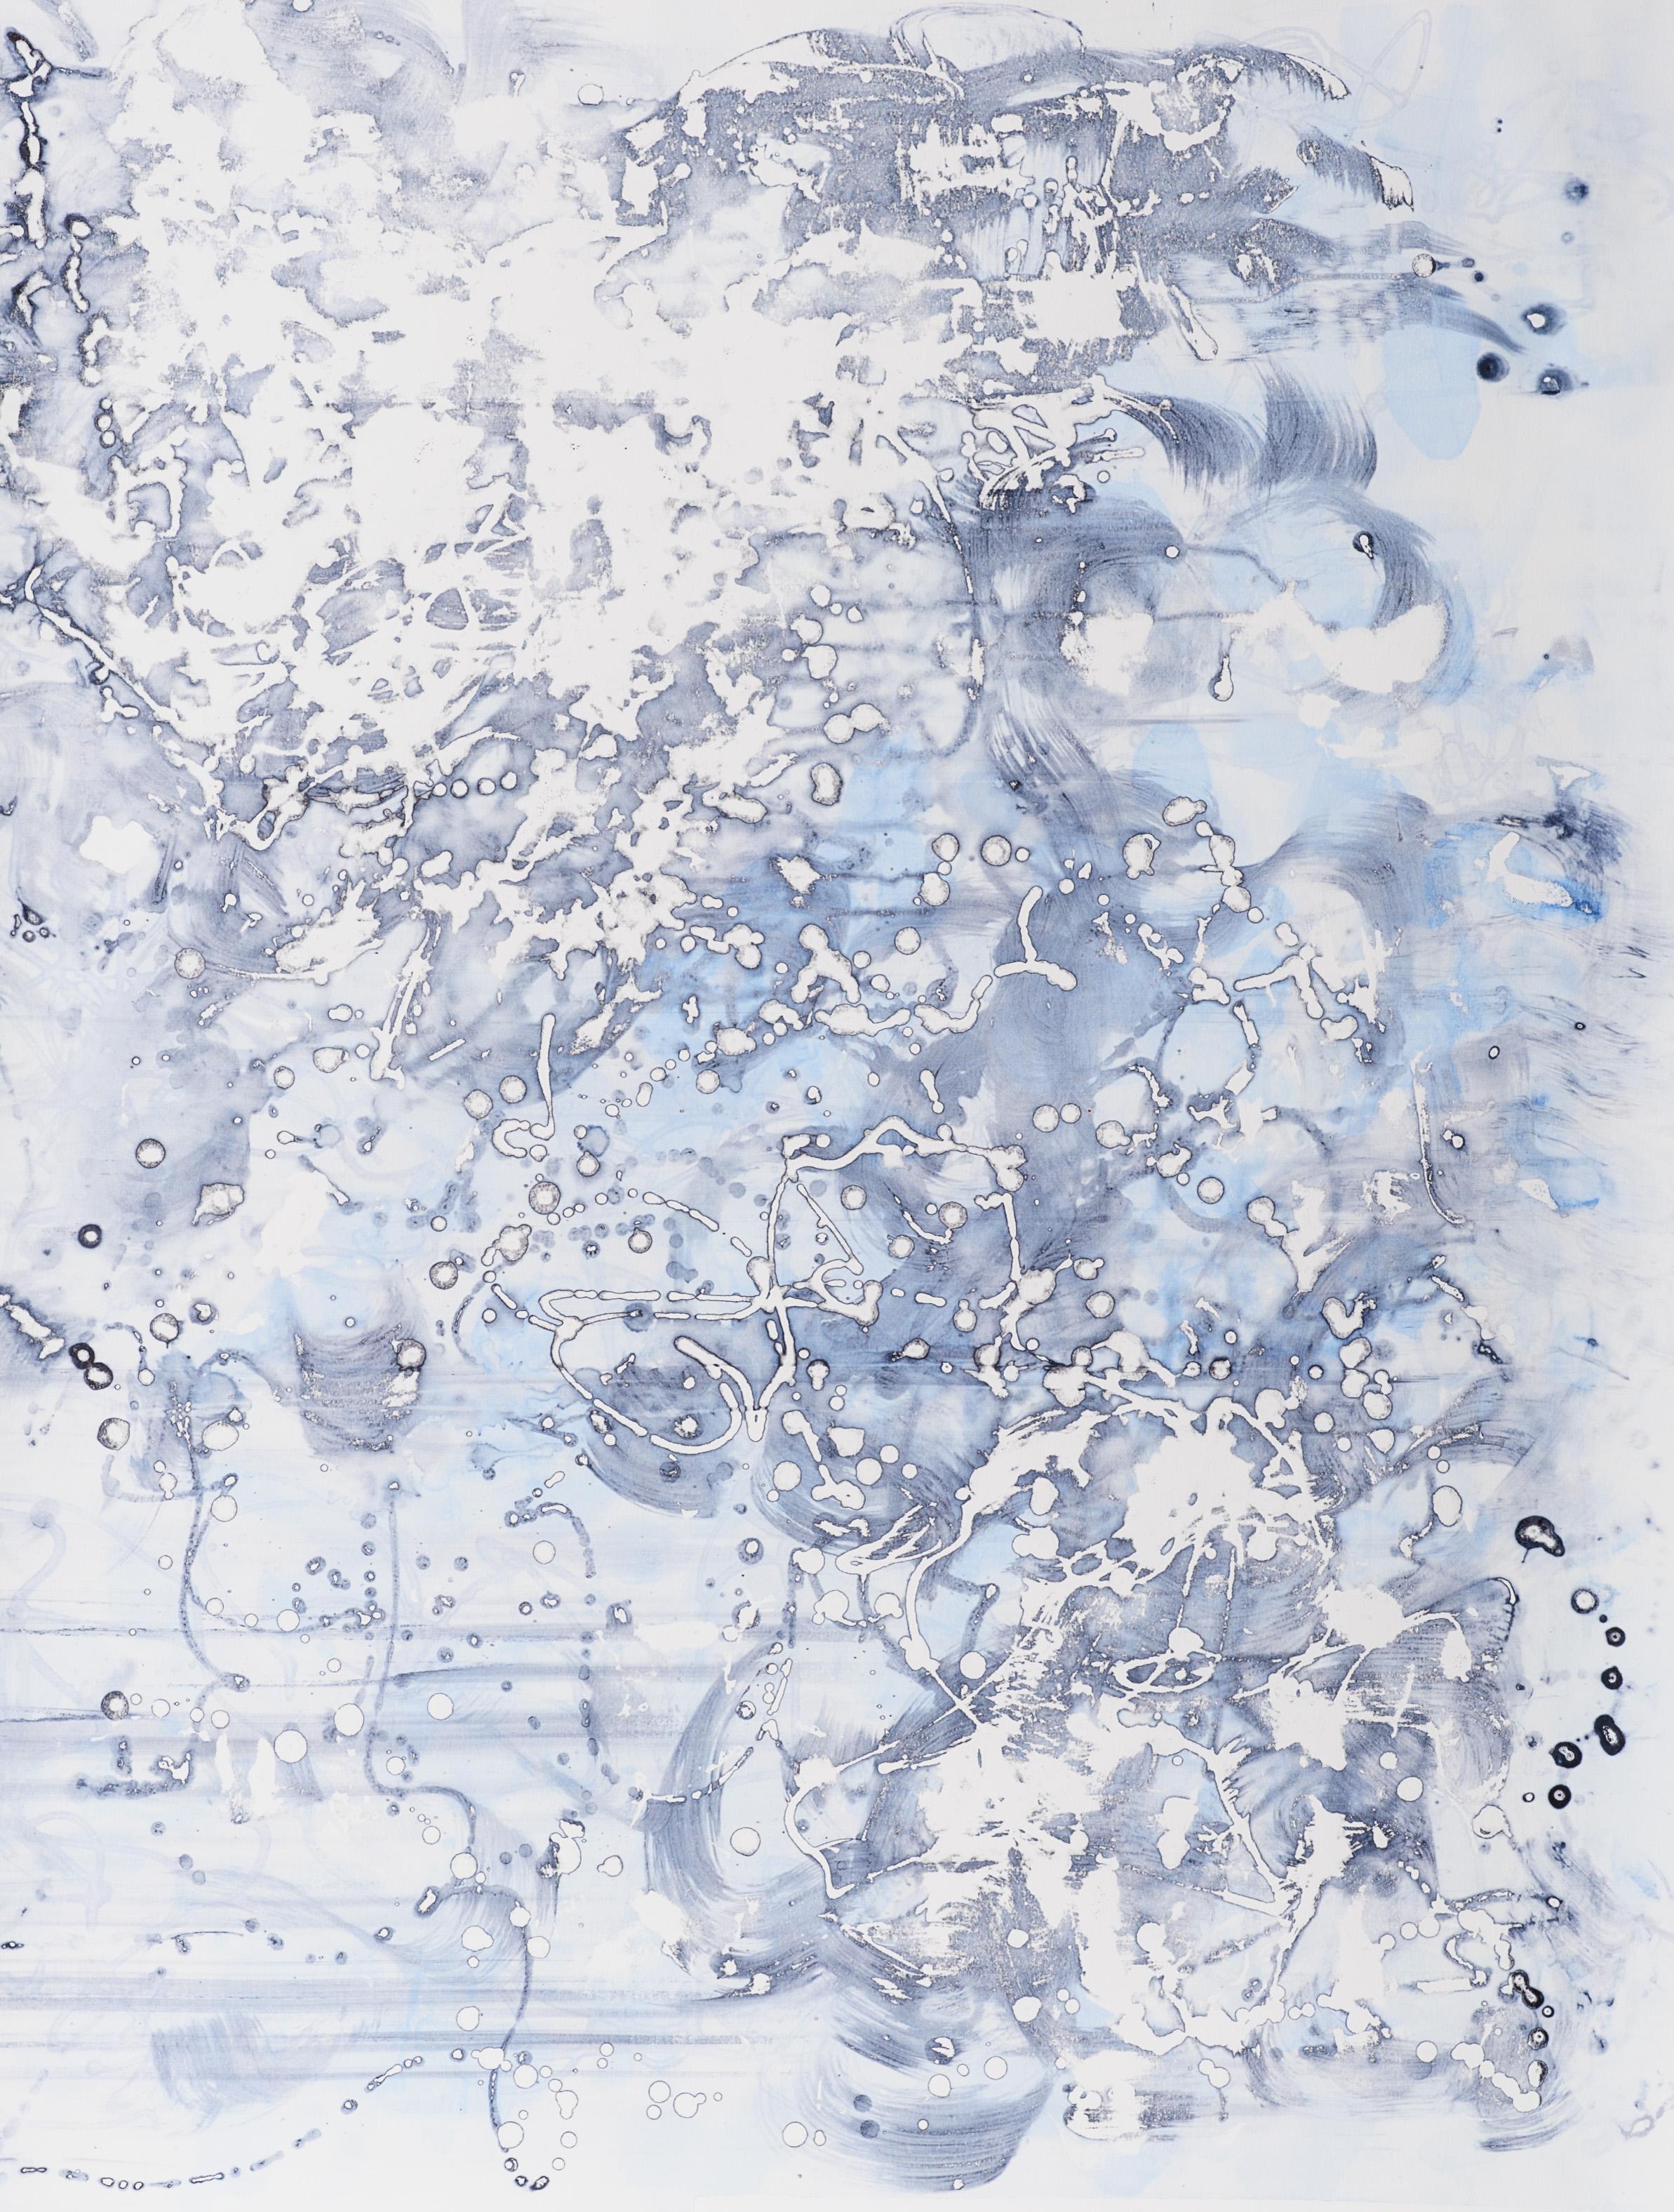 "Intergalactic III 30"" X 40"", silkscreen painting on paper, 2017"